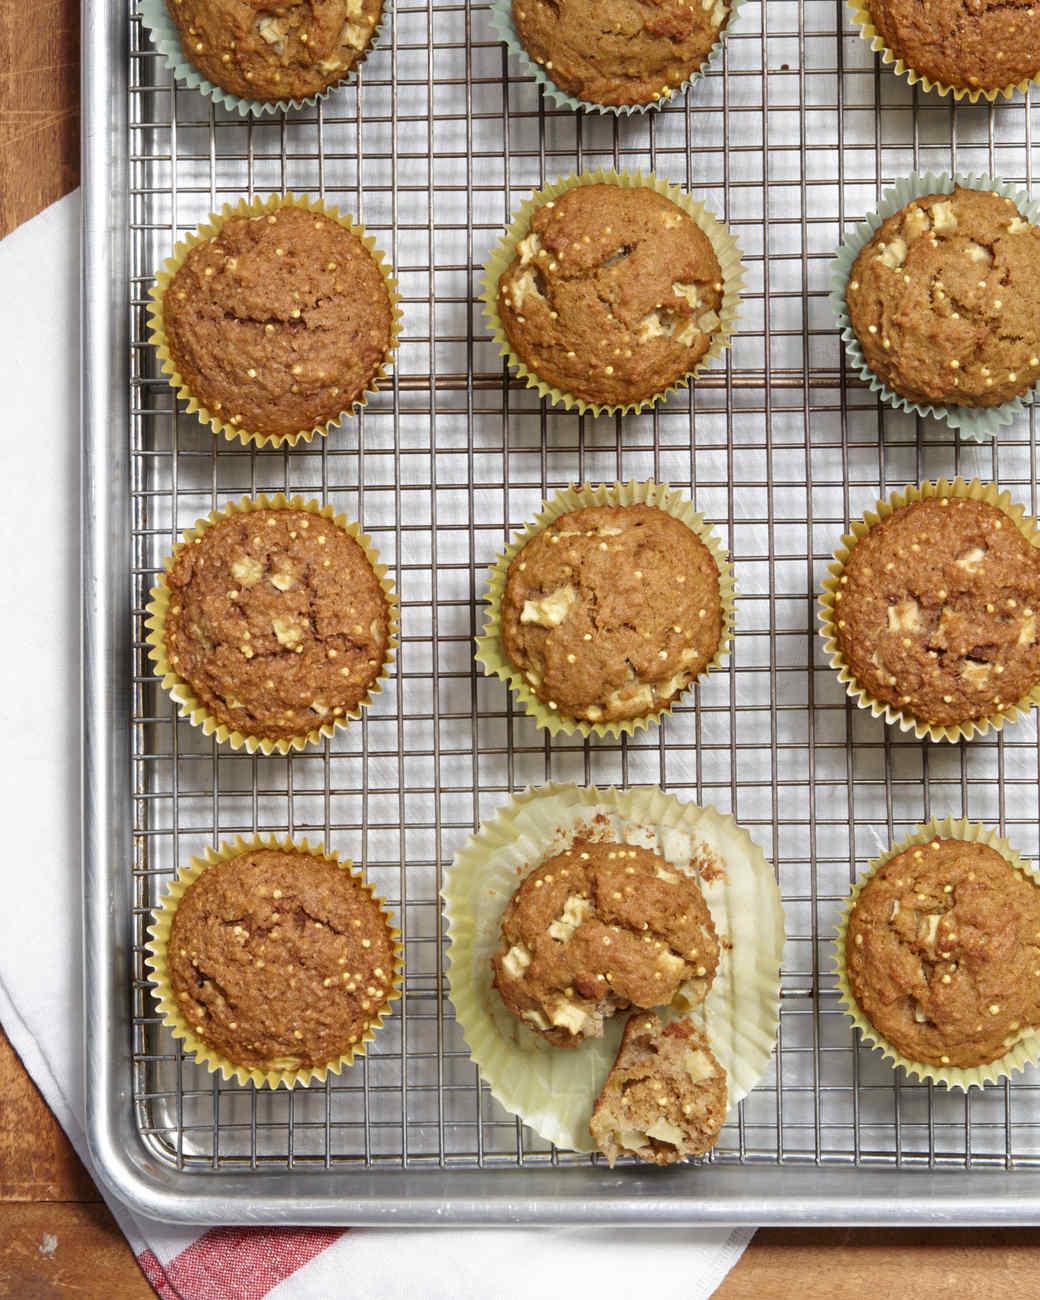 apple-bran-muffin-0065-d112370.jpg